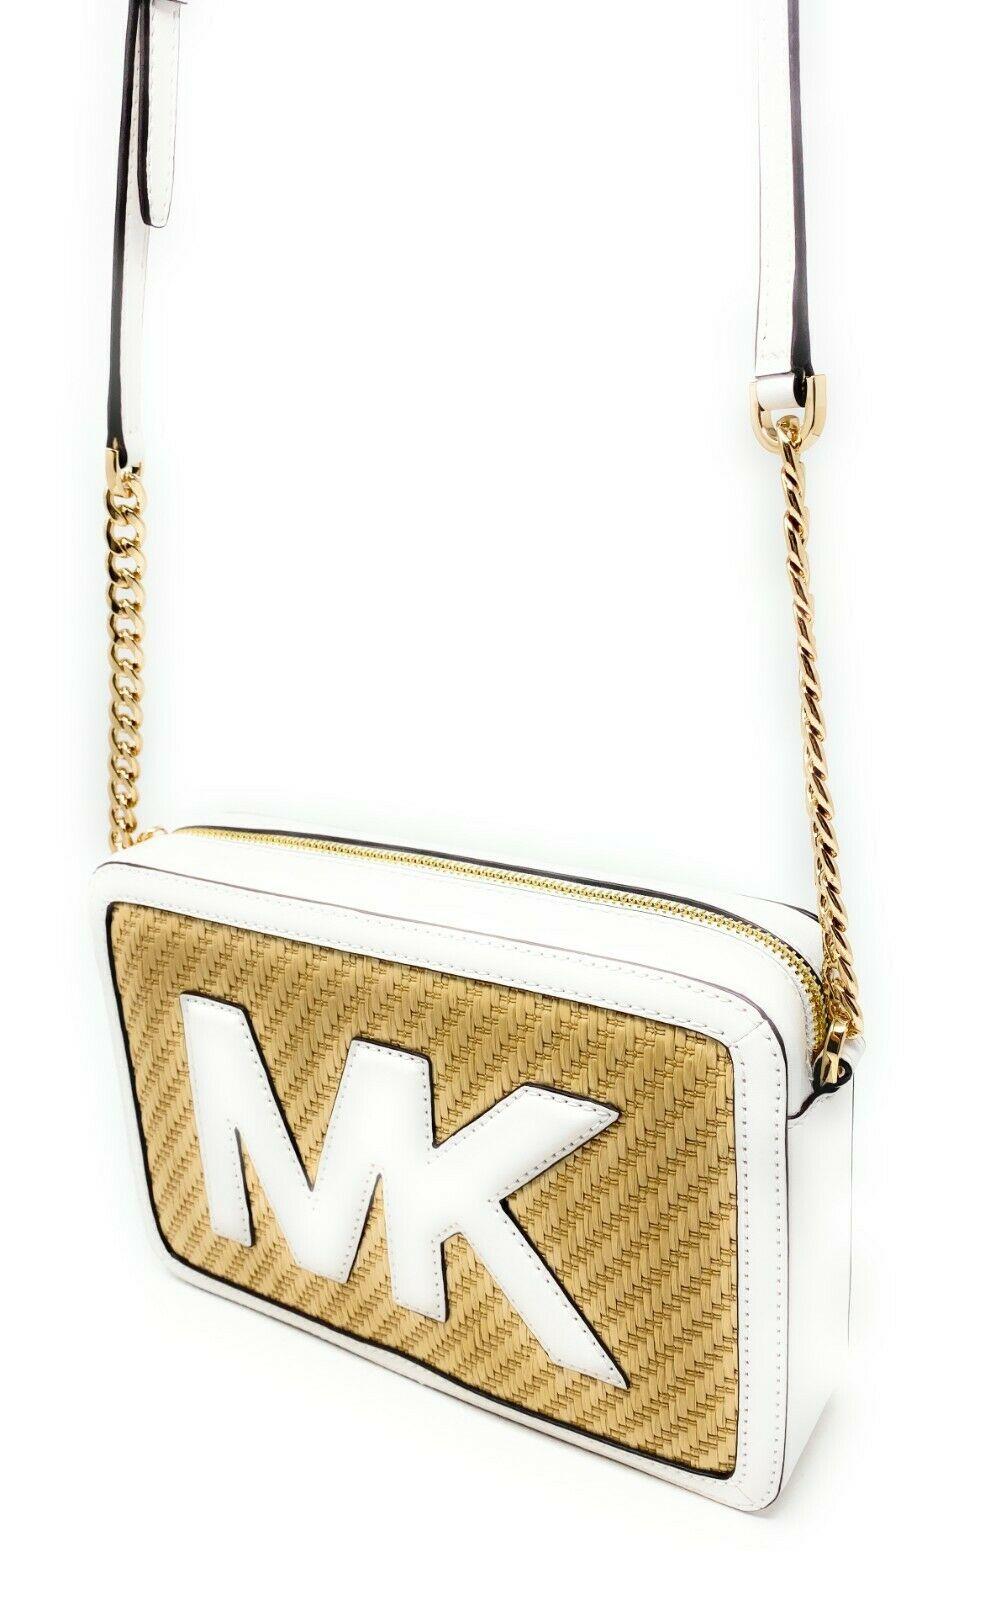 thumbnail 21 - Michael Kors Jet Set Item Large East West Crossbody Chain Handbag Clutch $298